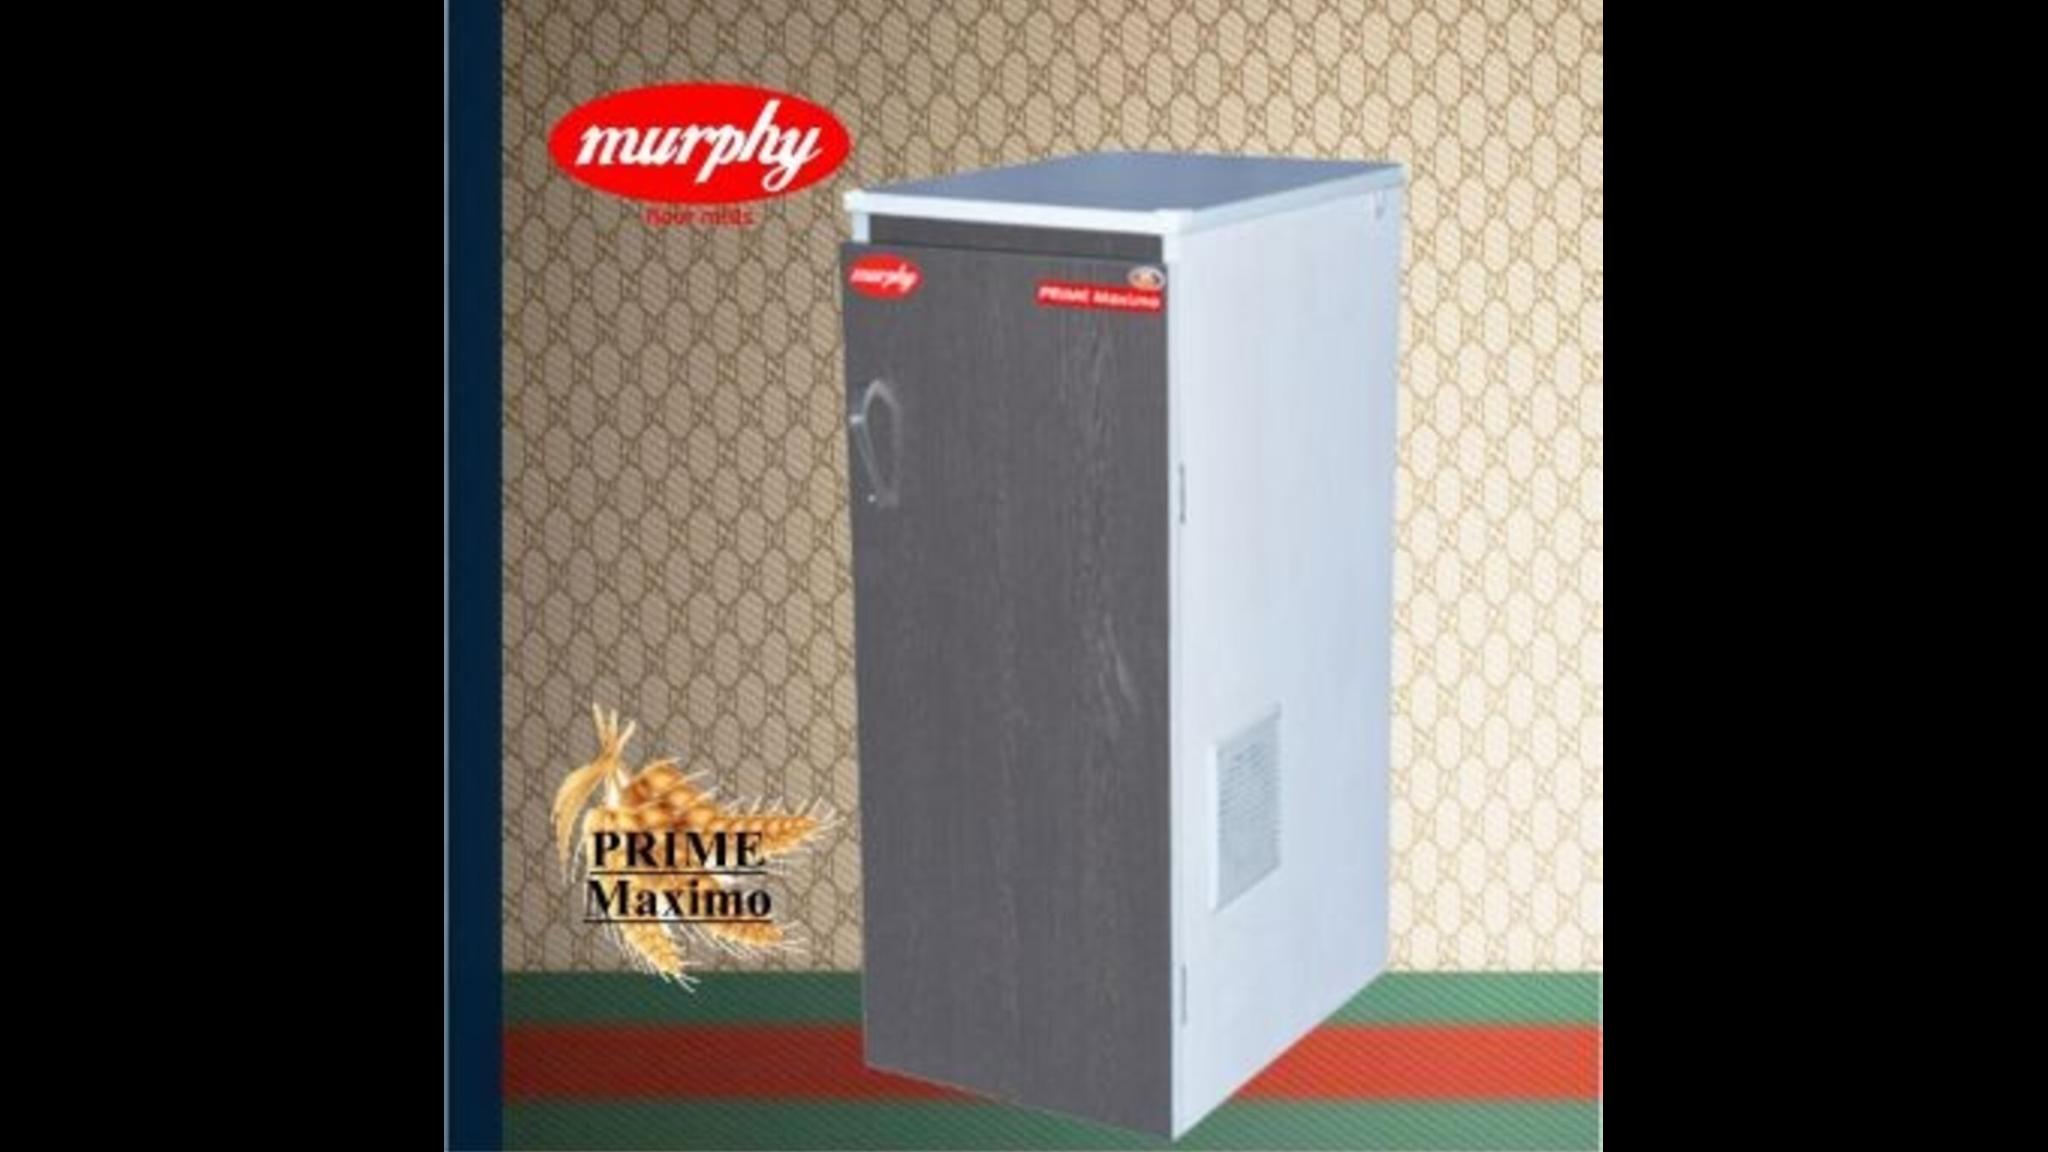 Murphy Flour Mills, Murphy Atta Chakki & Murphy Gharghanti Retailer from Navi Mumbai, Maharashtra, India.